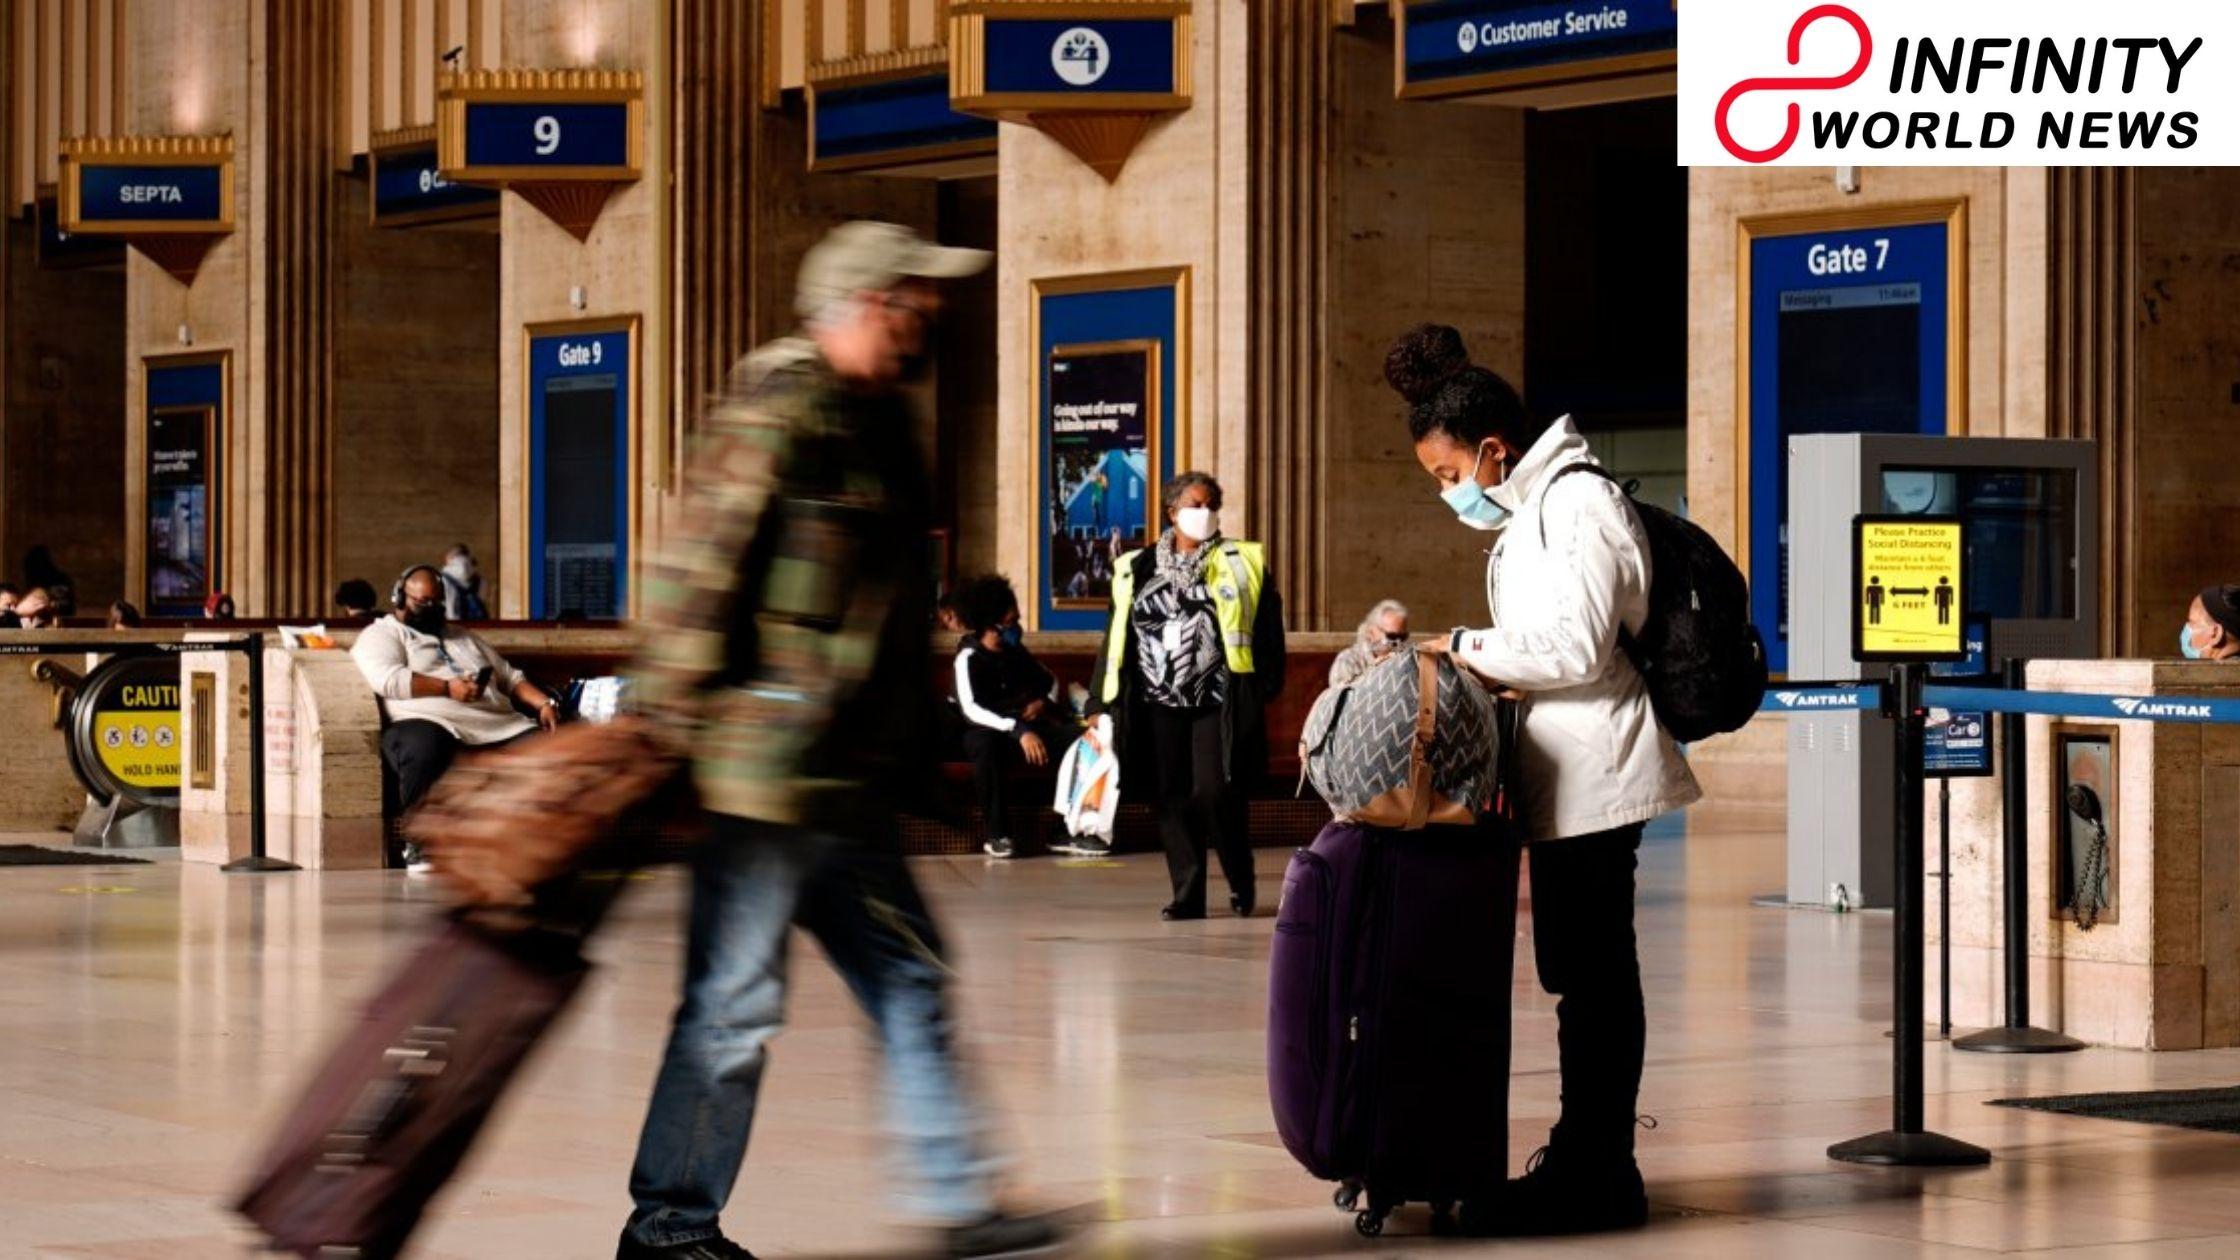 Covid Millions travel for Thanksgiving despite alerts